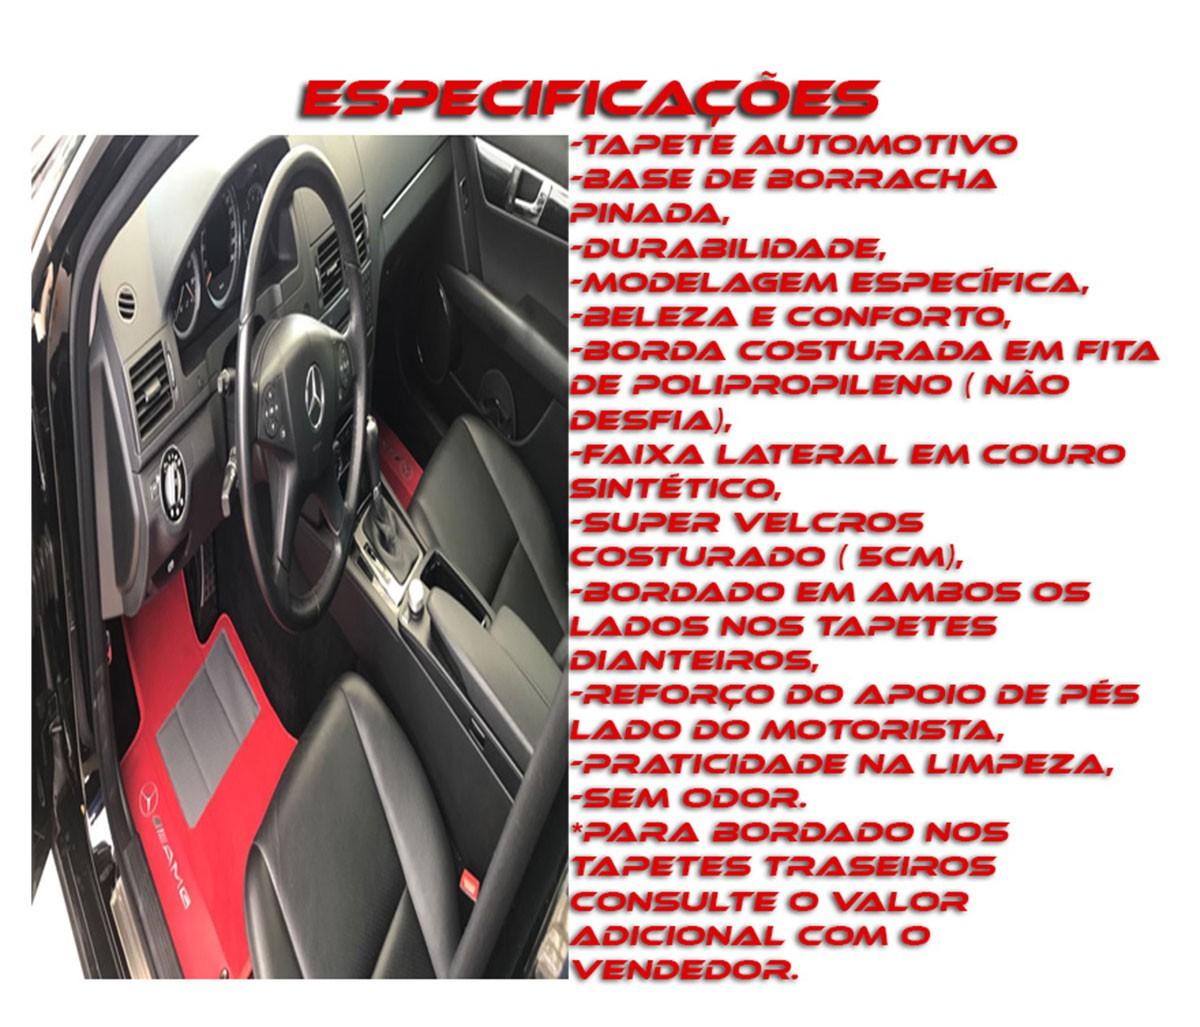 Tapete Hyundai Azera Borracha Pvc Com Base Pinada Hitto